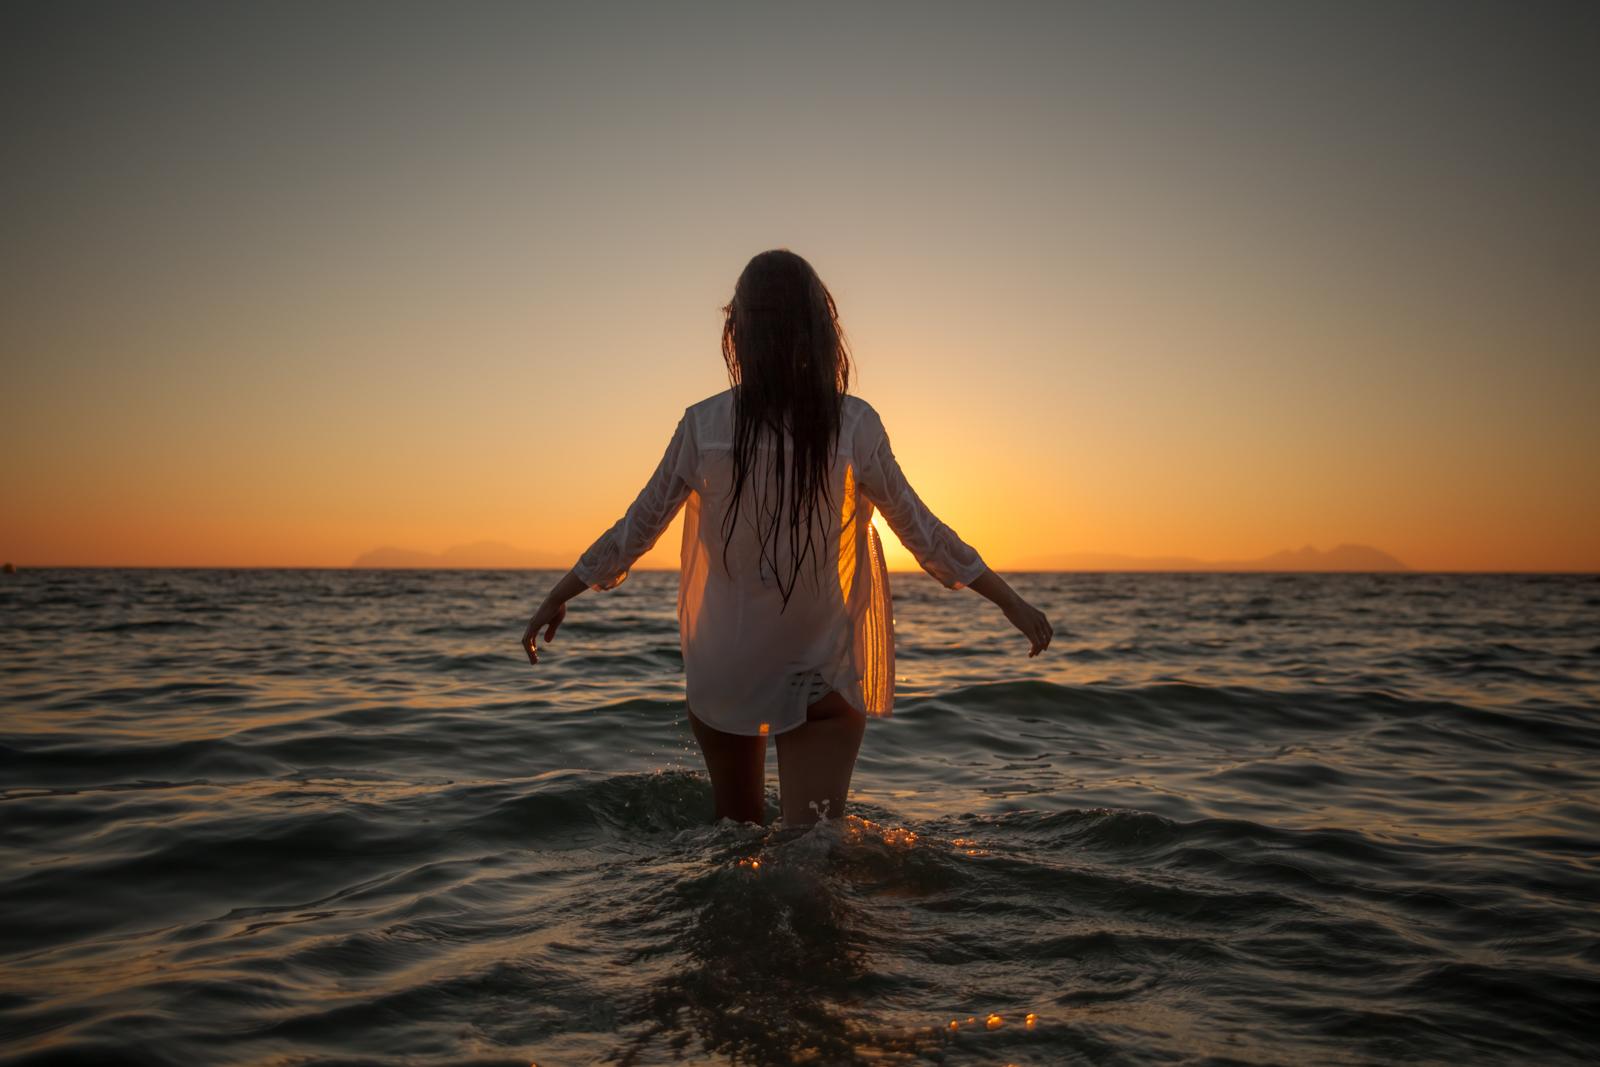 Sesi n con luc a en la playa de samil vigo dani v zquez fotograf a - Fotos de hamacas en la playa ...